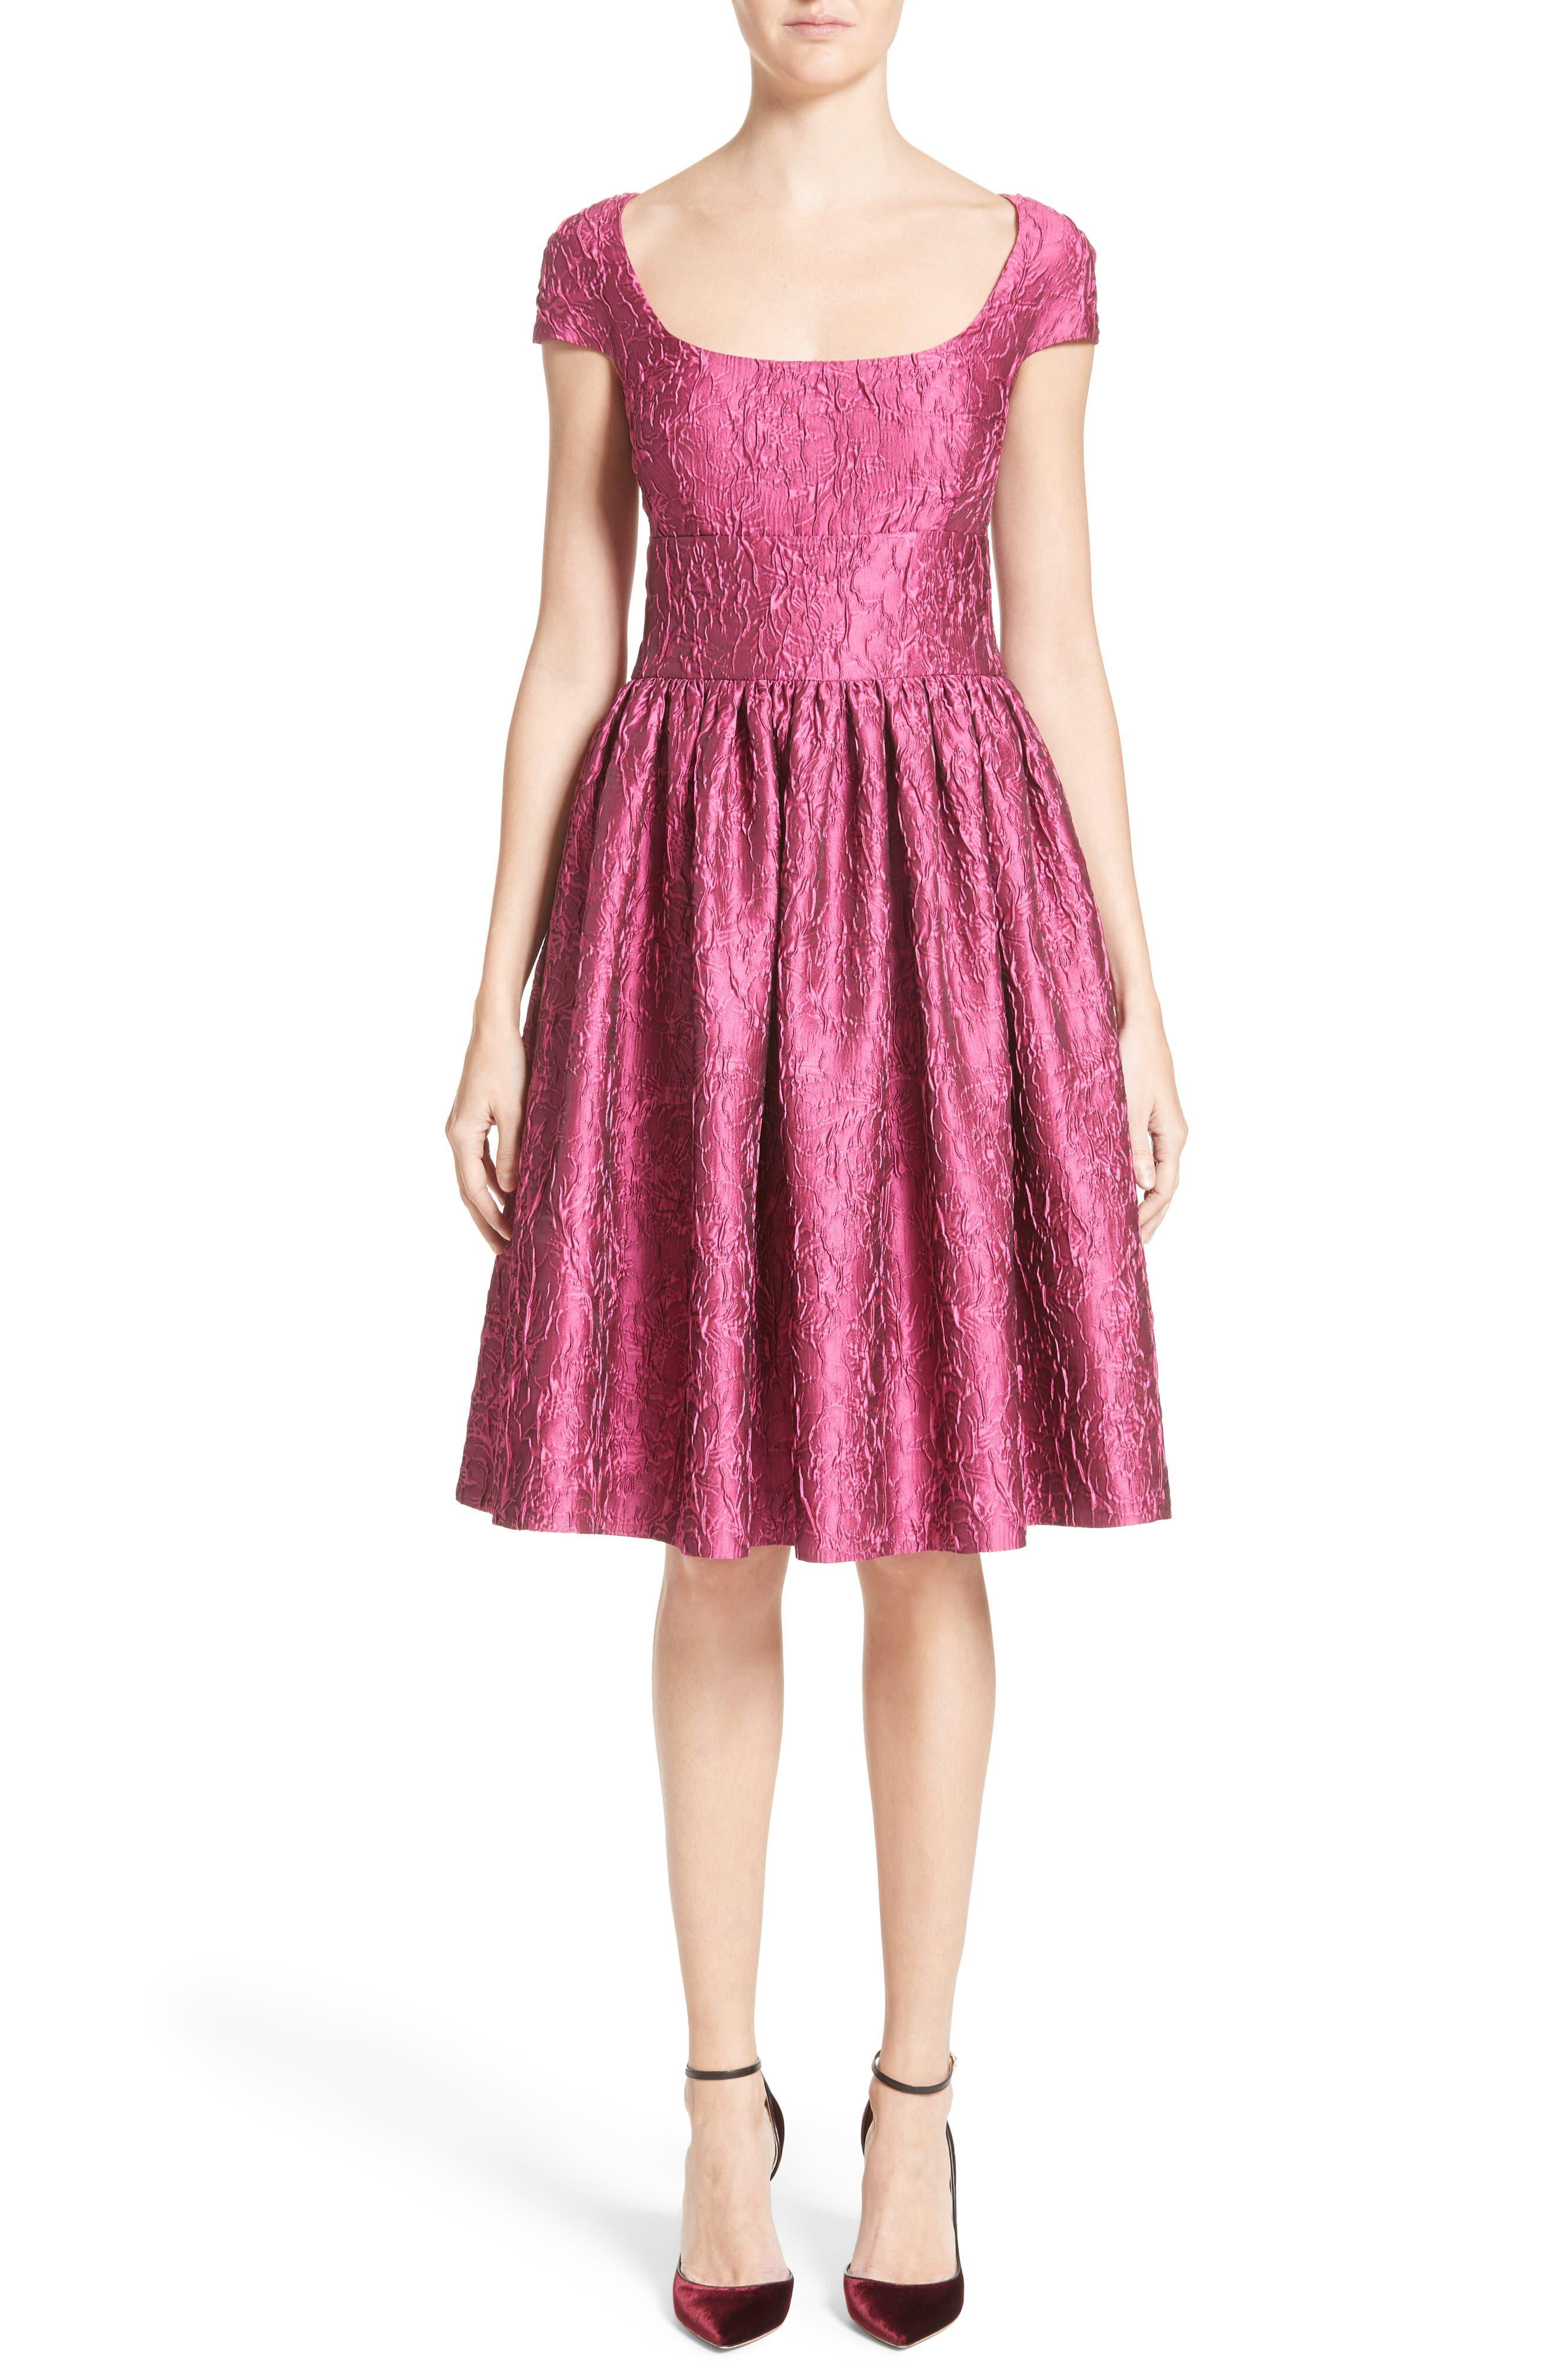 Alternate Image 1 Selected - Badgley Mischka Couture Cap Sleeve Brocade Party Dress (Nordstrom Exclusive)